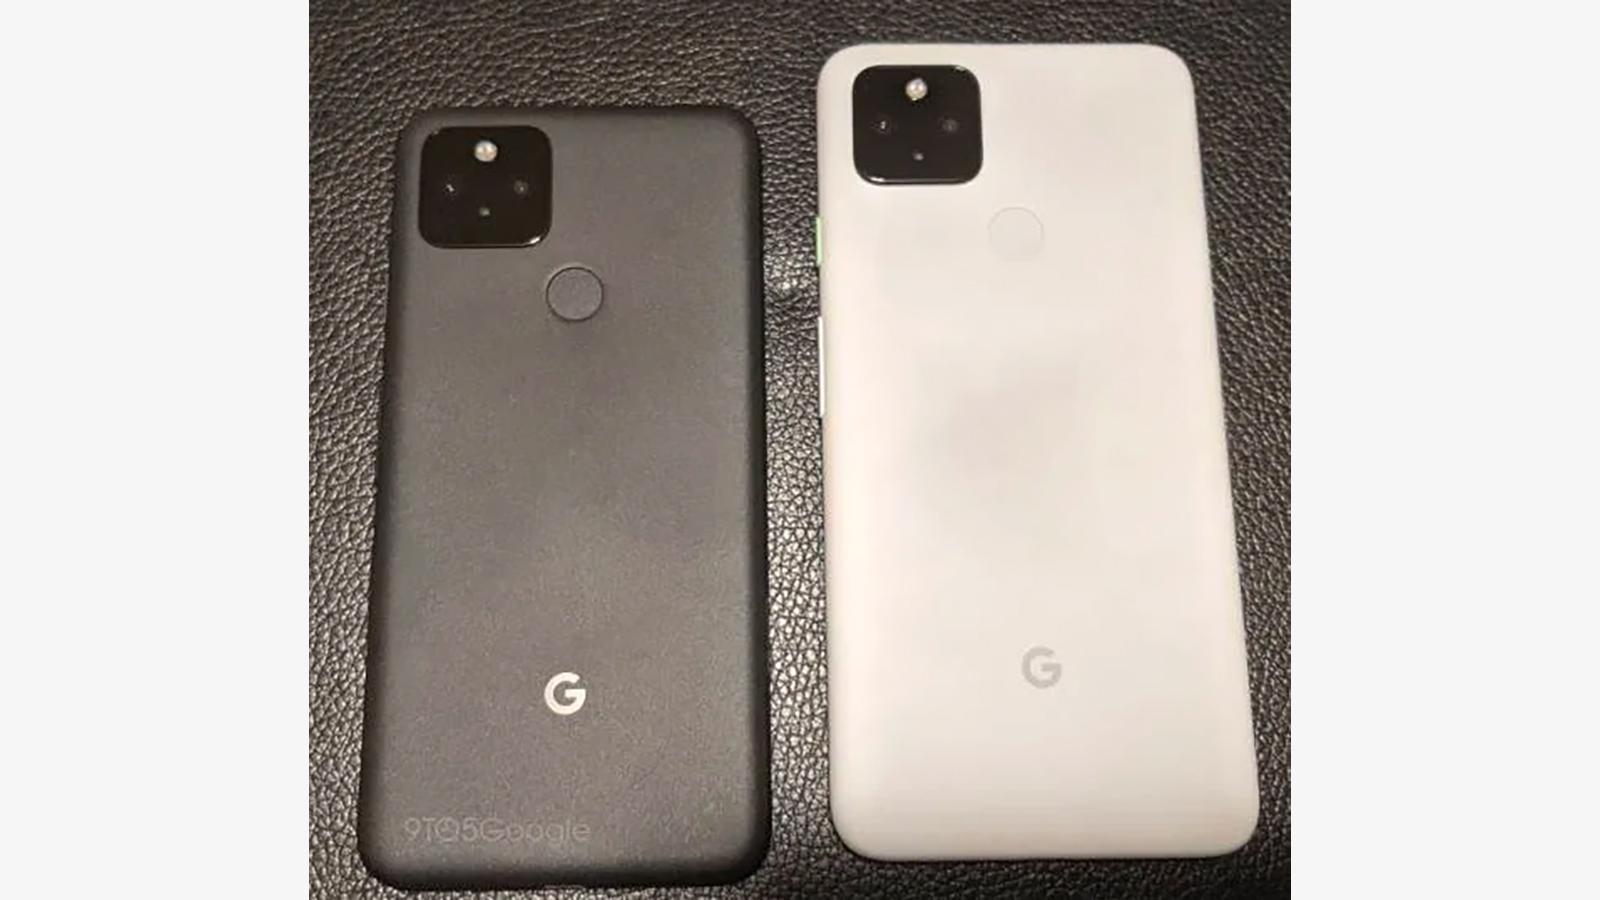 Google Pixel 5 leak Google Pixel 4a 5G leak